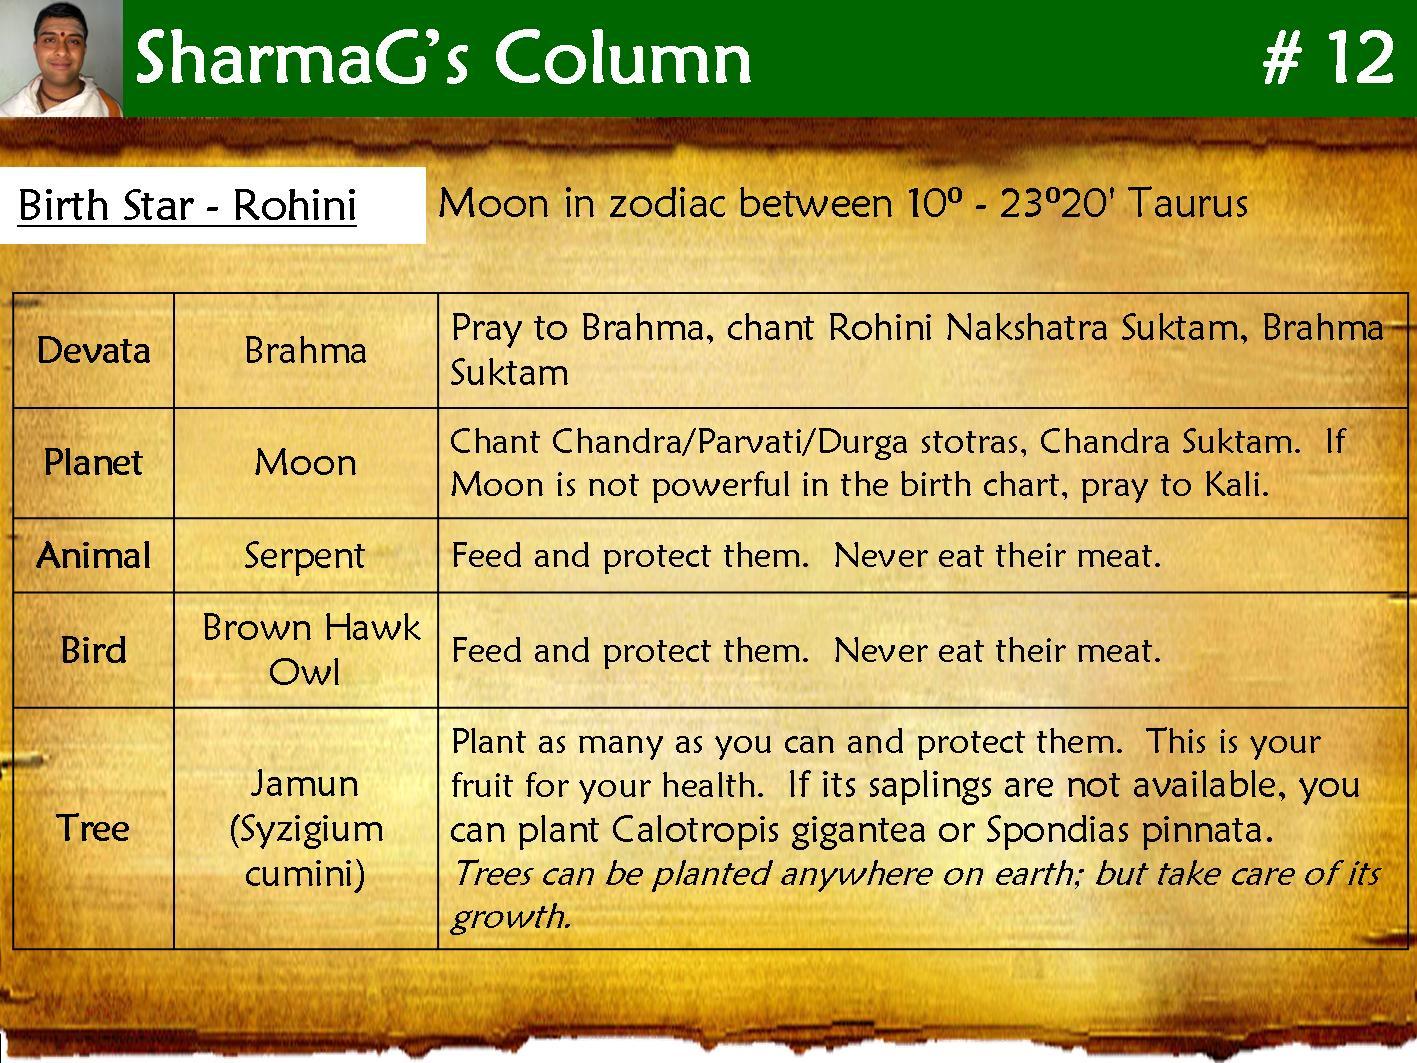 Vedic astrology birth star nakshatra rohini nvjuhfo Image collections